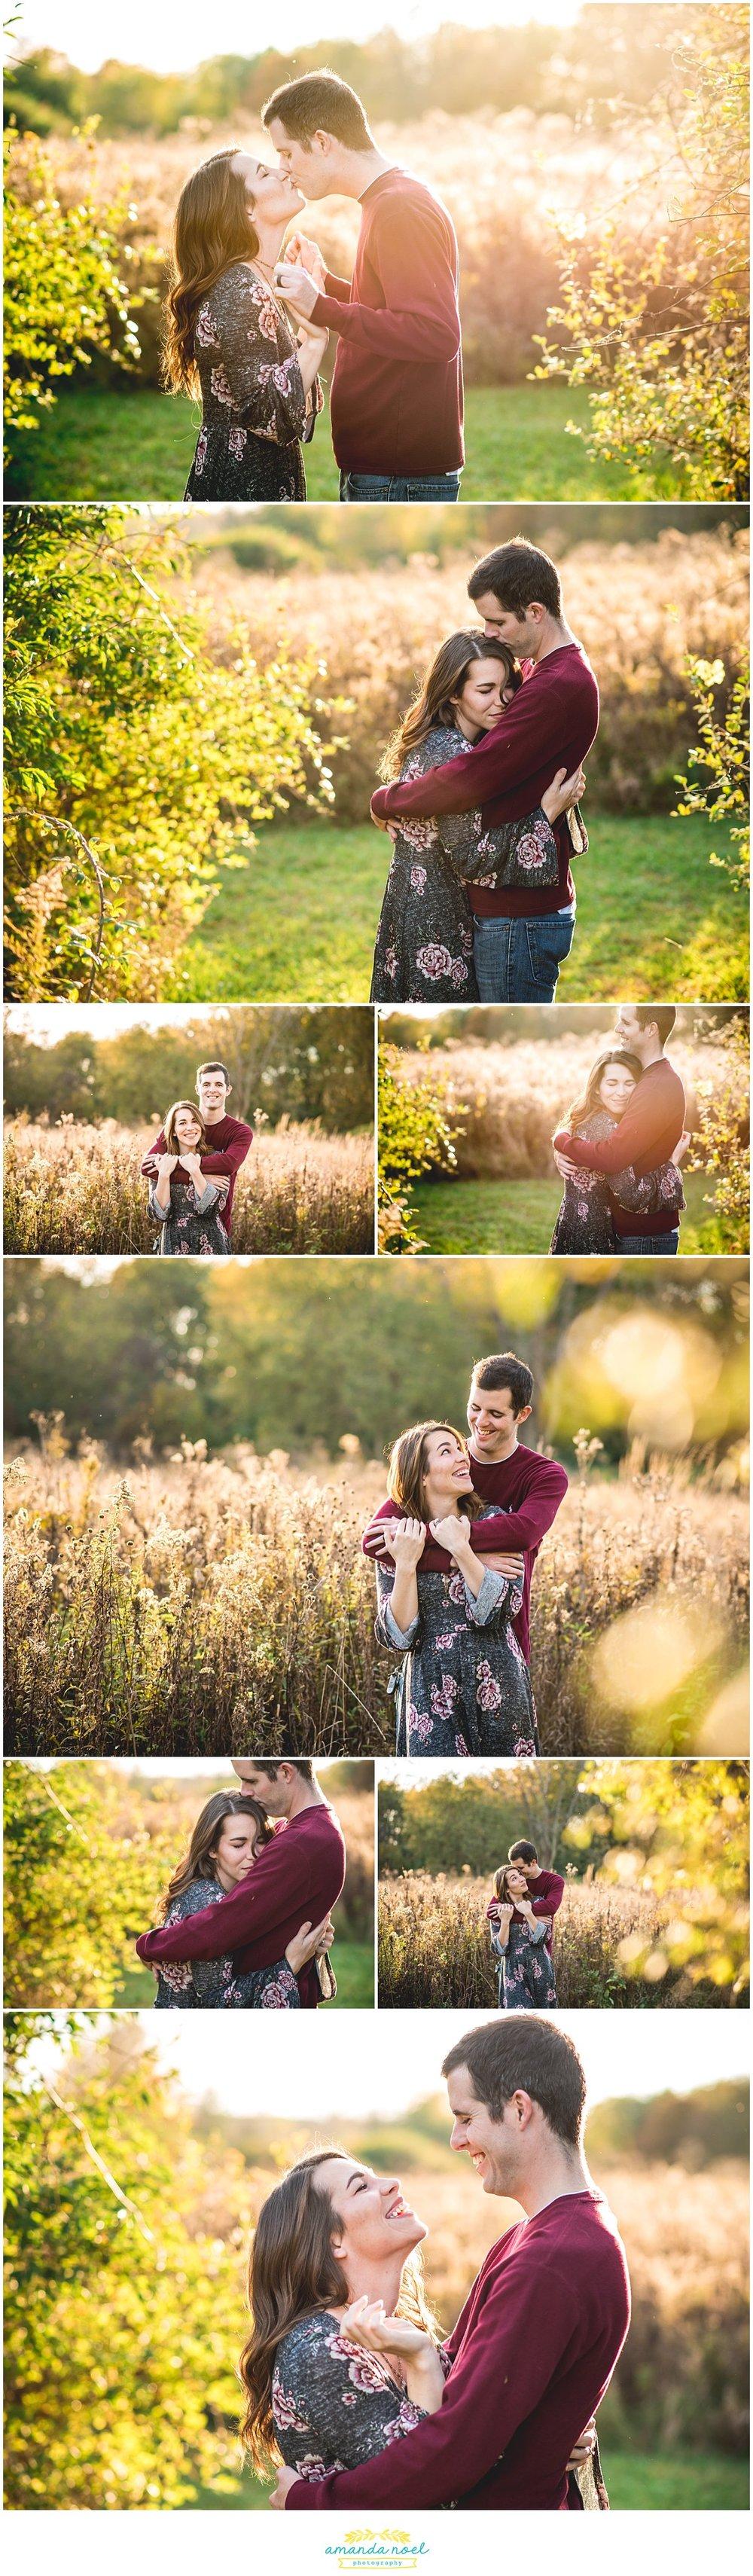 Columbus-Ohio-emotive-couple-photographer-romantic-session-in-field